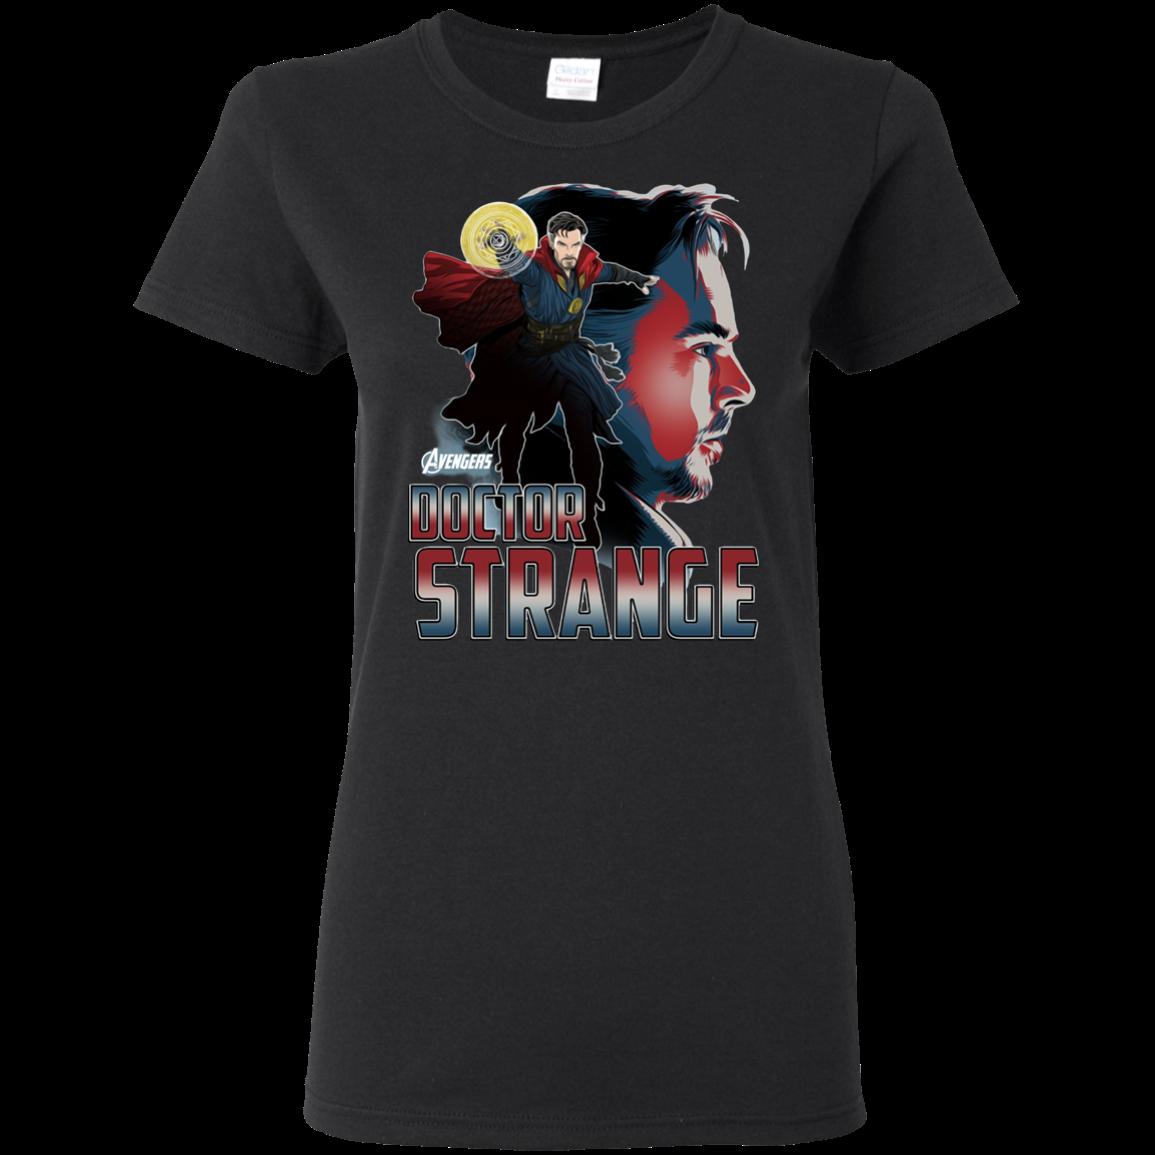 Avengers Infinity War Doctor Strange Head T shirt Hoodie Sweater Women 5.3